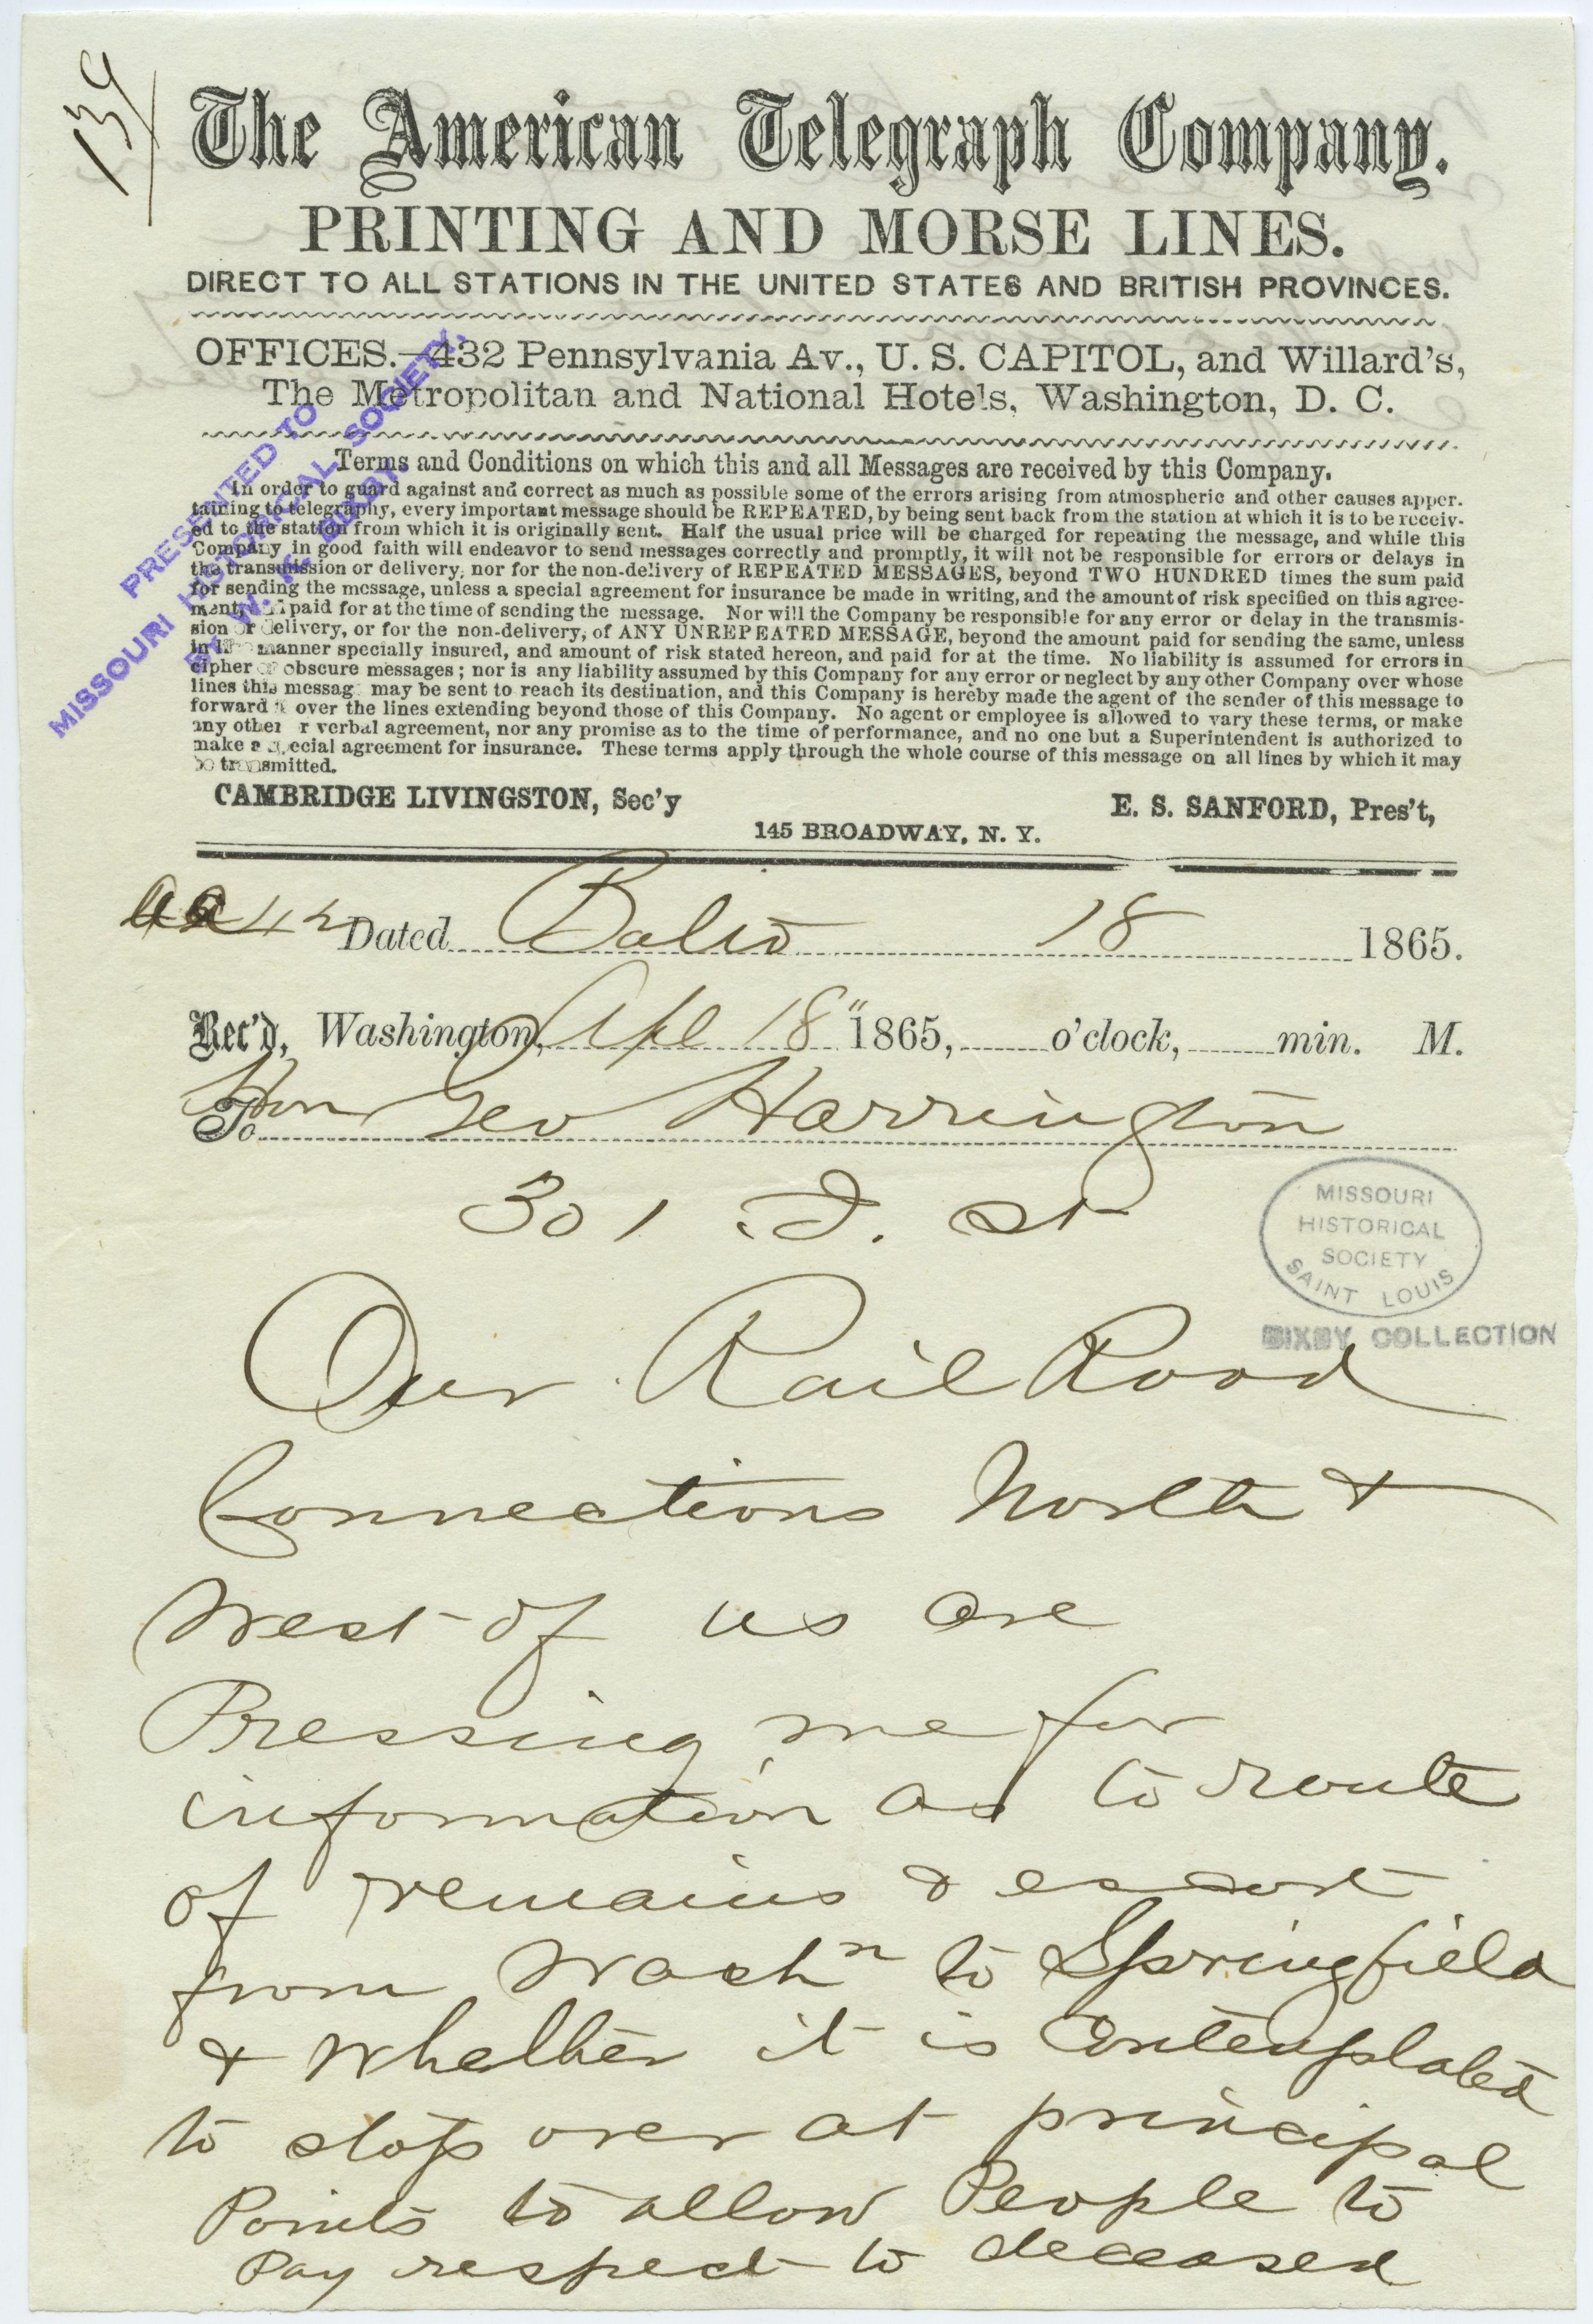 American Telegraph Company telegram of W.P. Smith, Balio. [Baltimore], to Hon. Geo. Harrington [Geo. Harrington], 301 D St., April 18, 1865